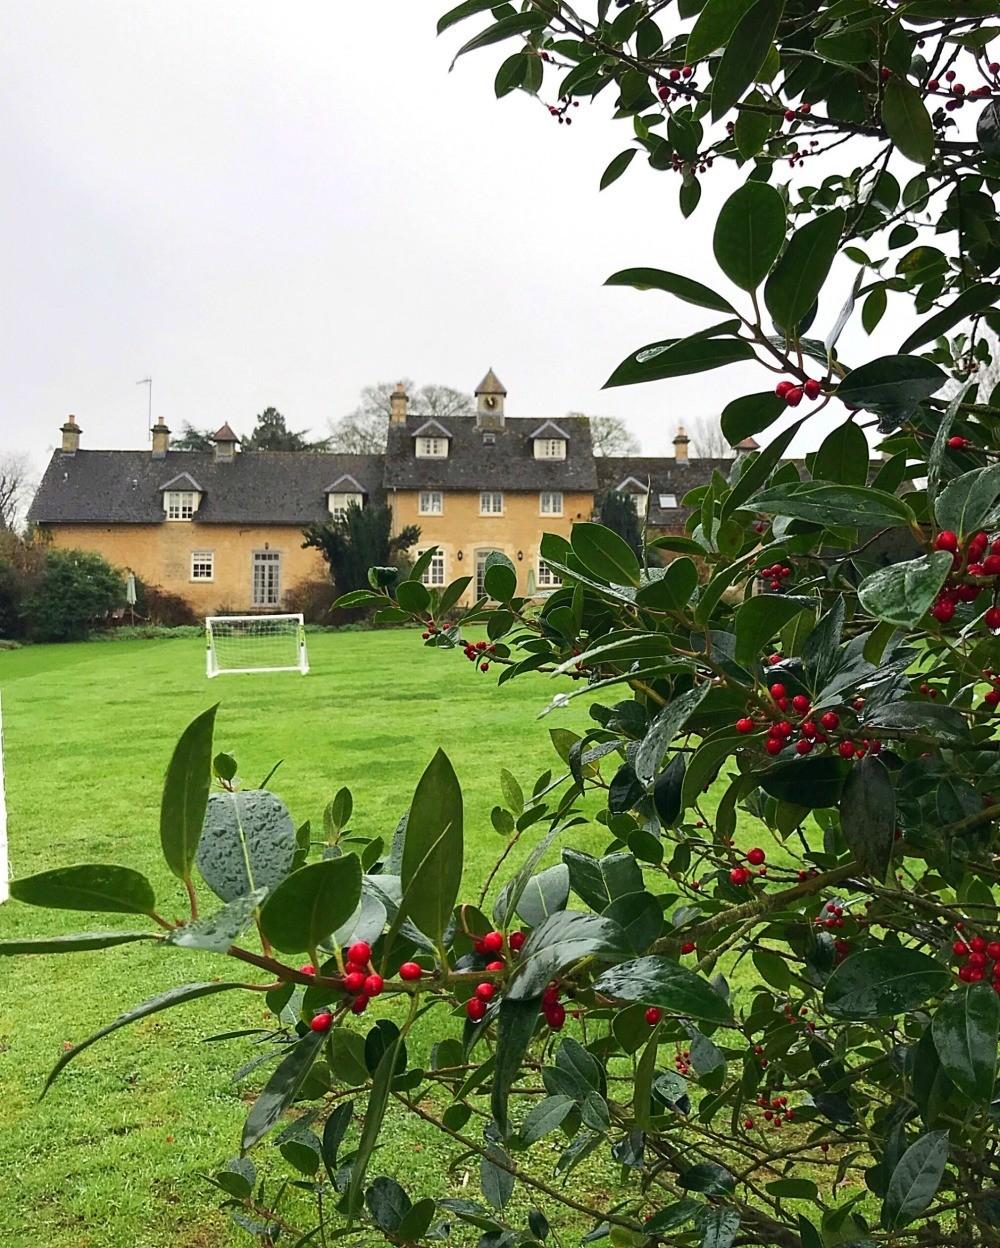 Gardens at Bruern Cottages - Photo Heatheronhertravels.com